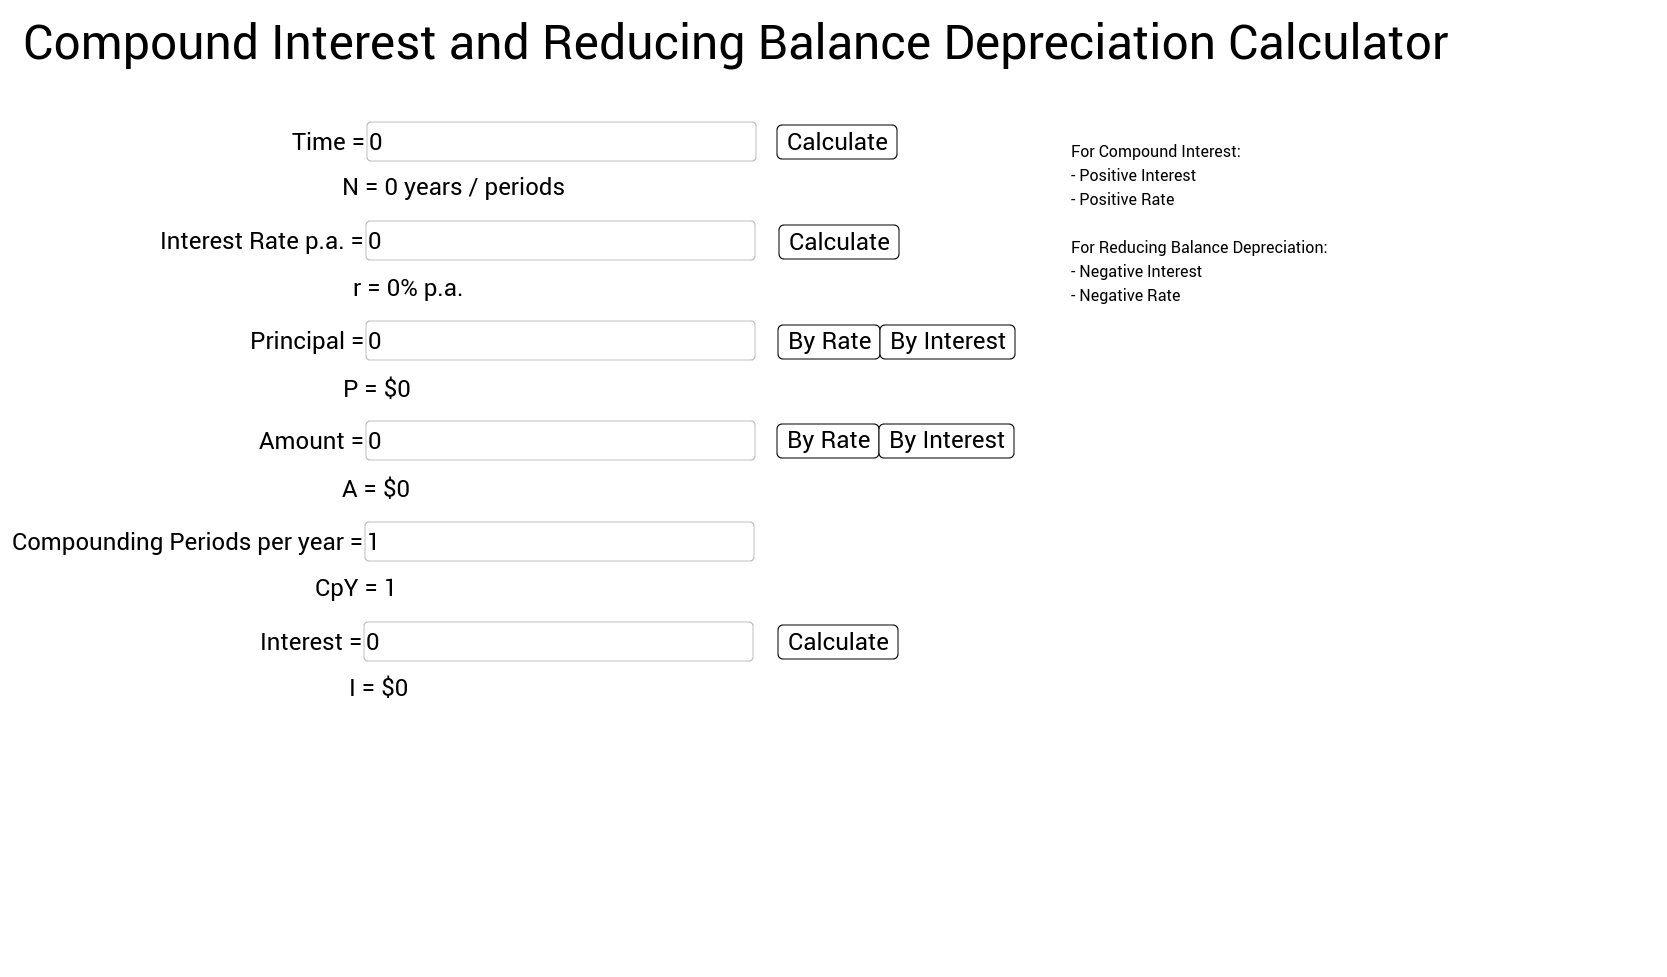 Compound Interest and Reducing Balance Calculator - GeoGebra